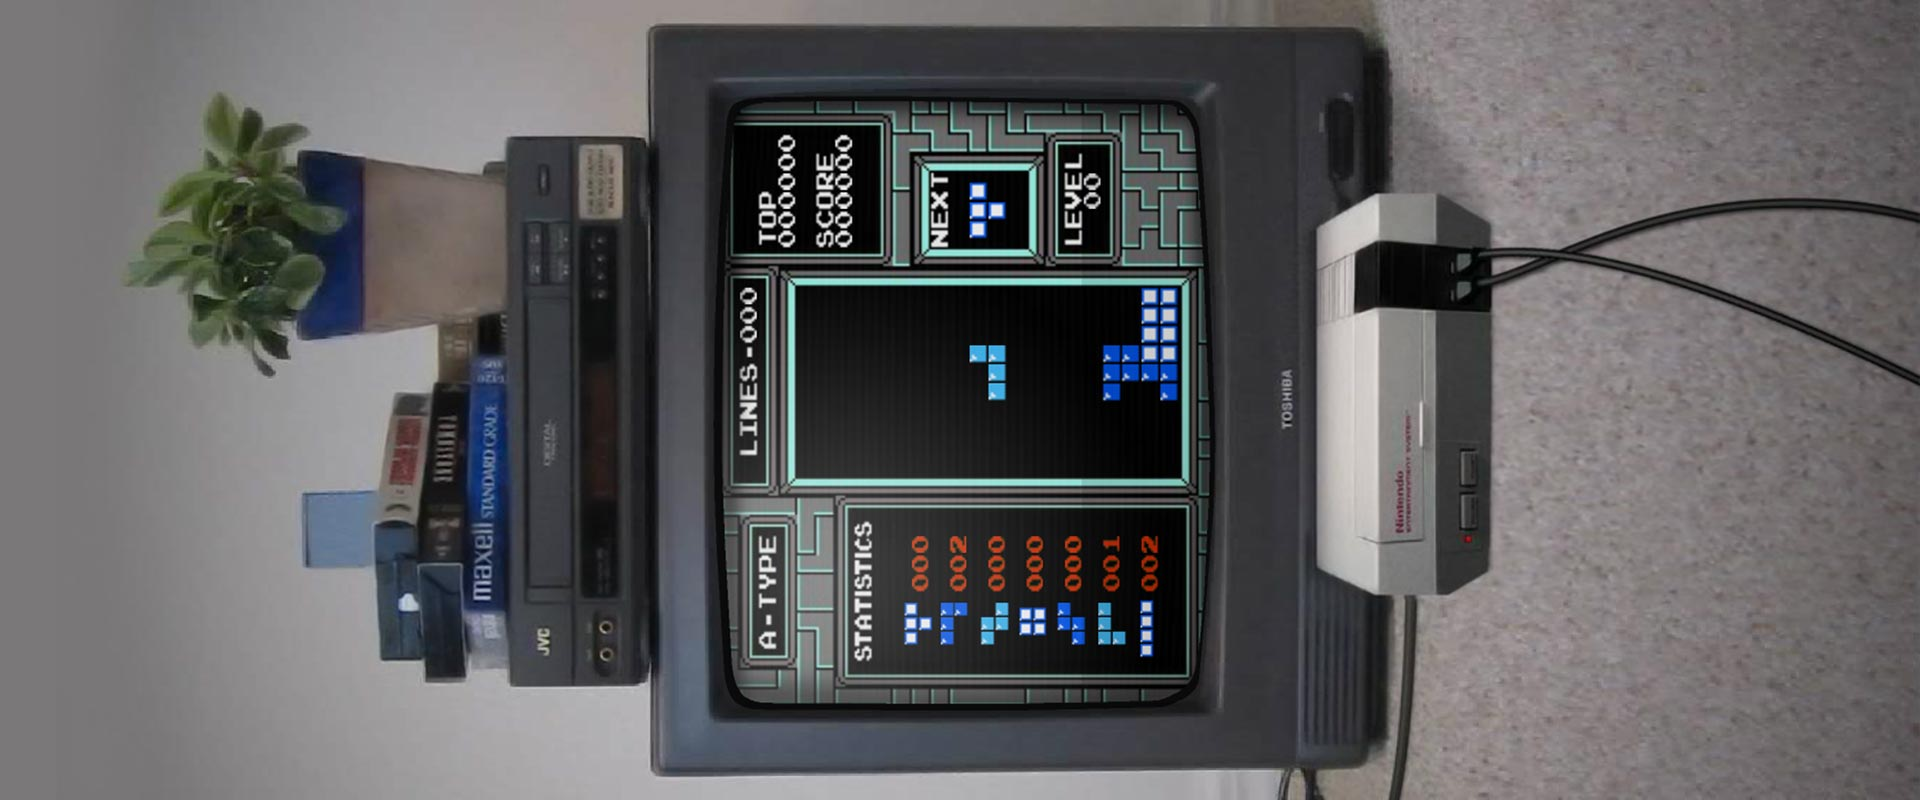 Tetris, Tetris, Tetris.